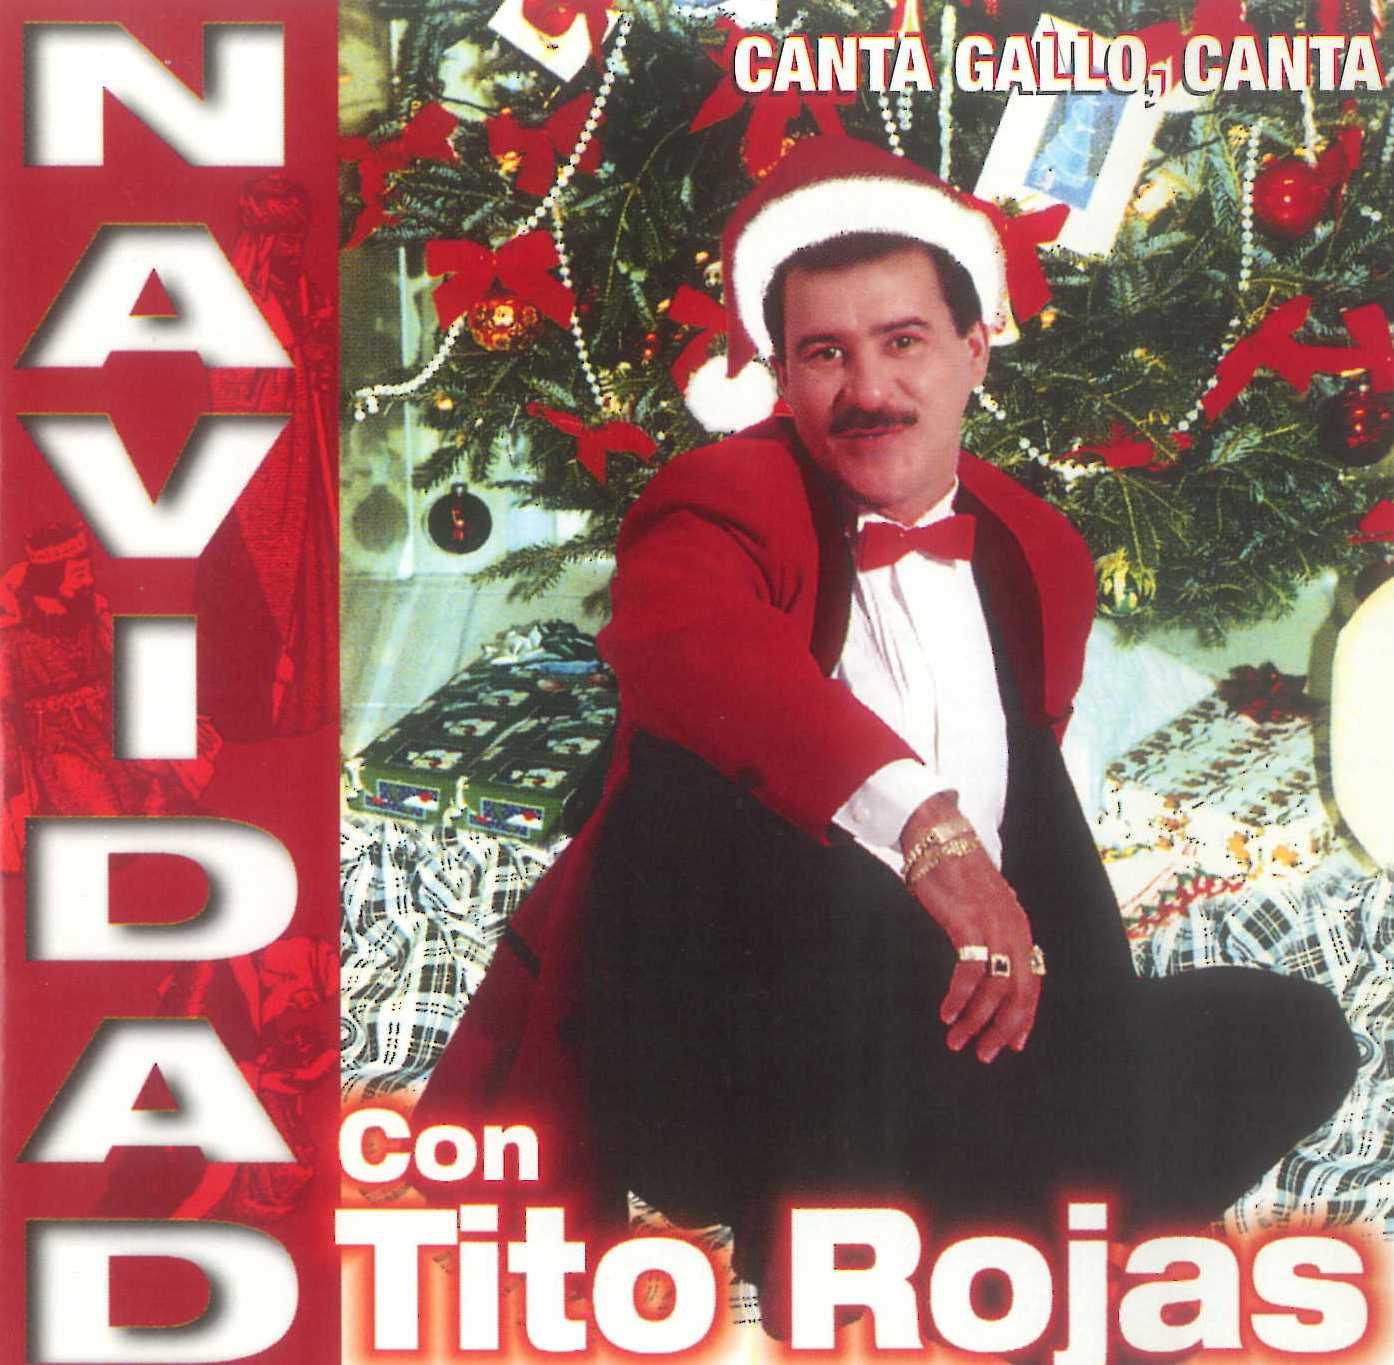 Navidad con Tito Rojas: Canta gallo, canta